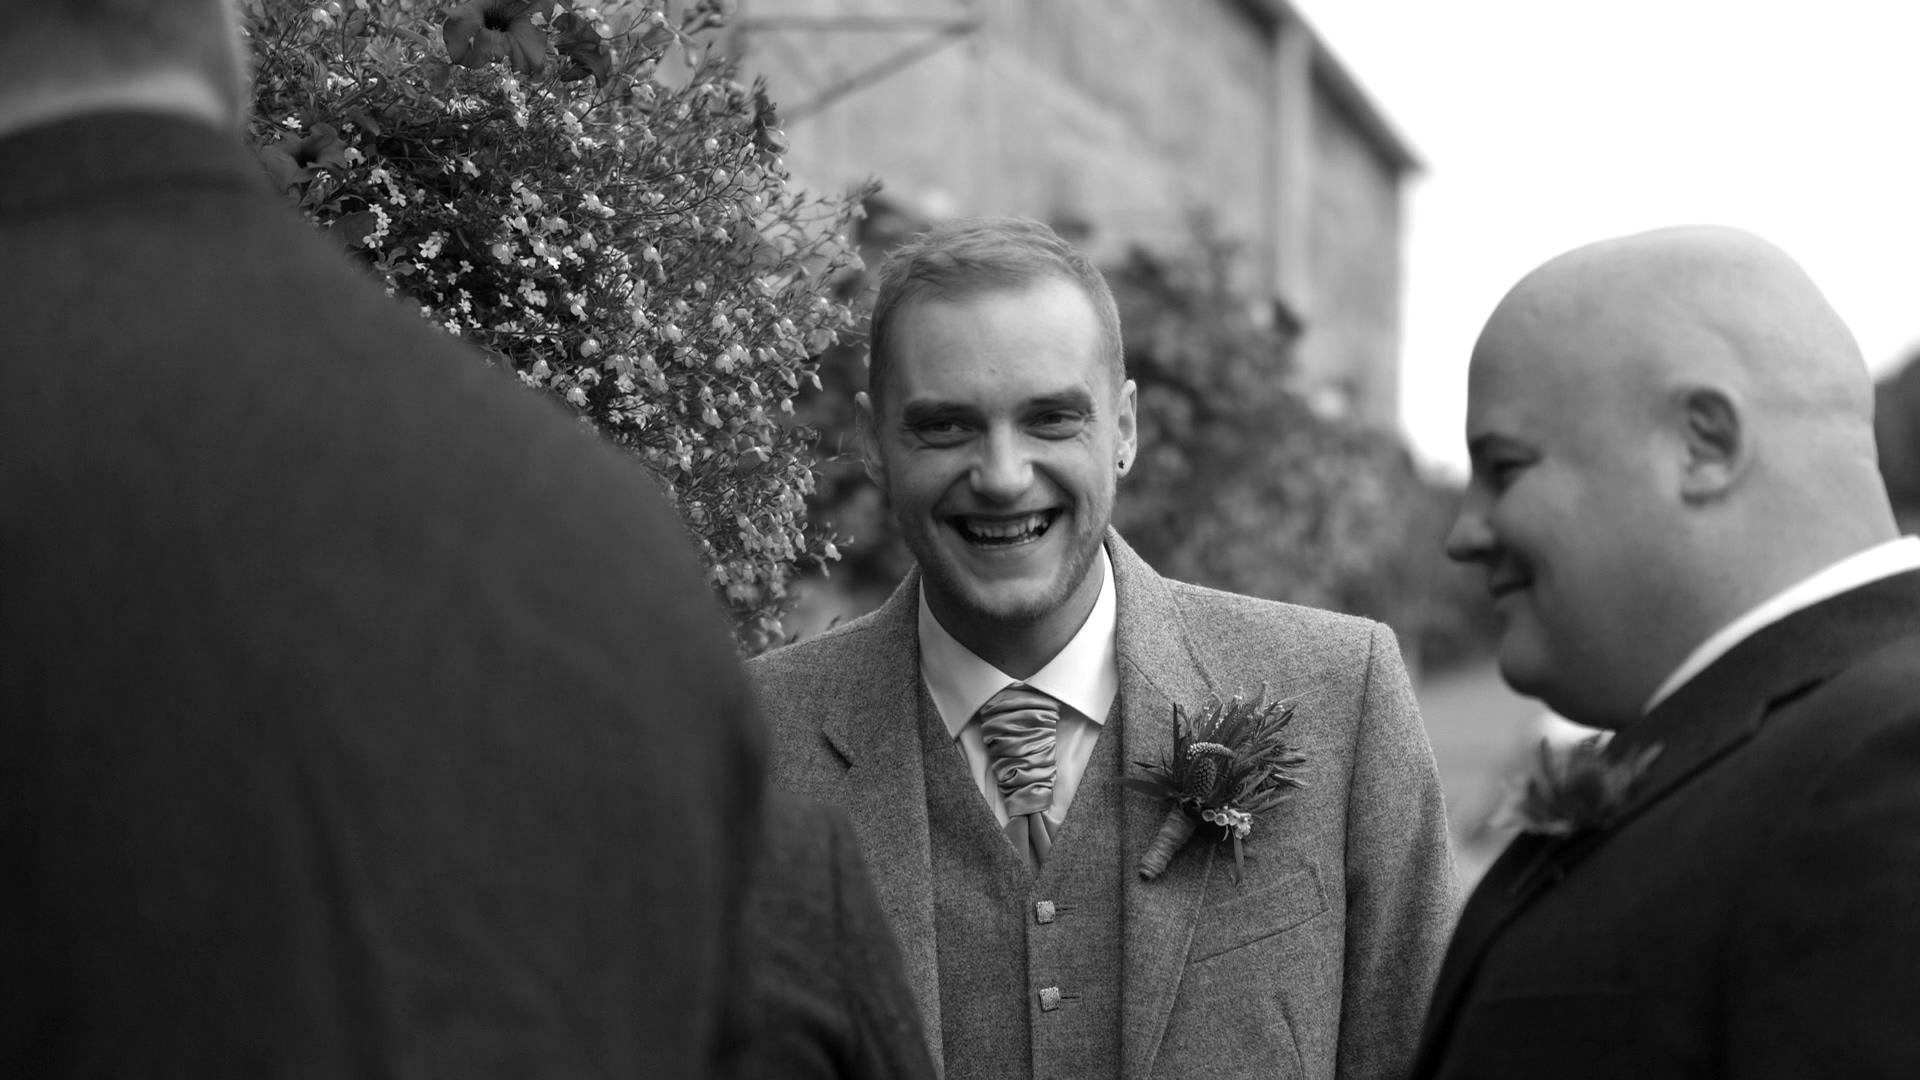 ASWANLEY-SUMMER-WEDDING (05).jpg